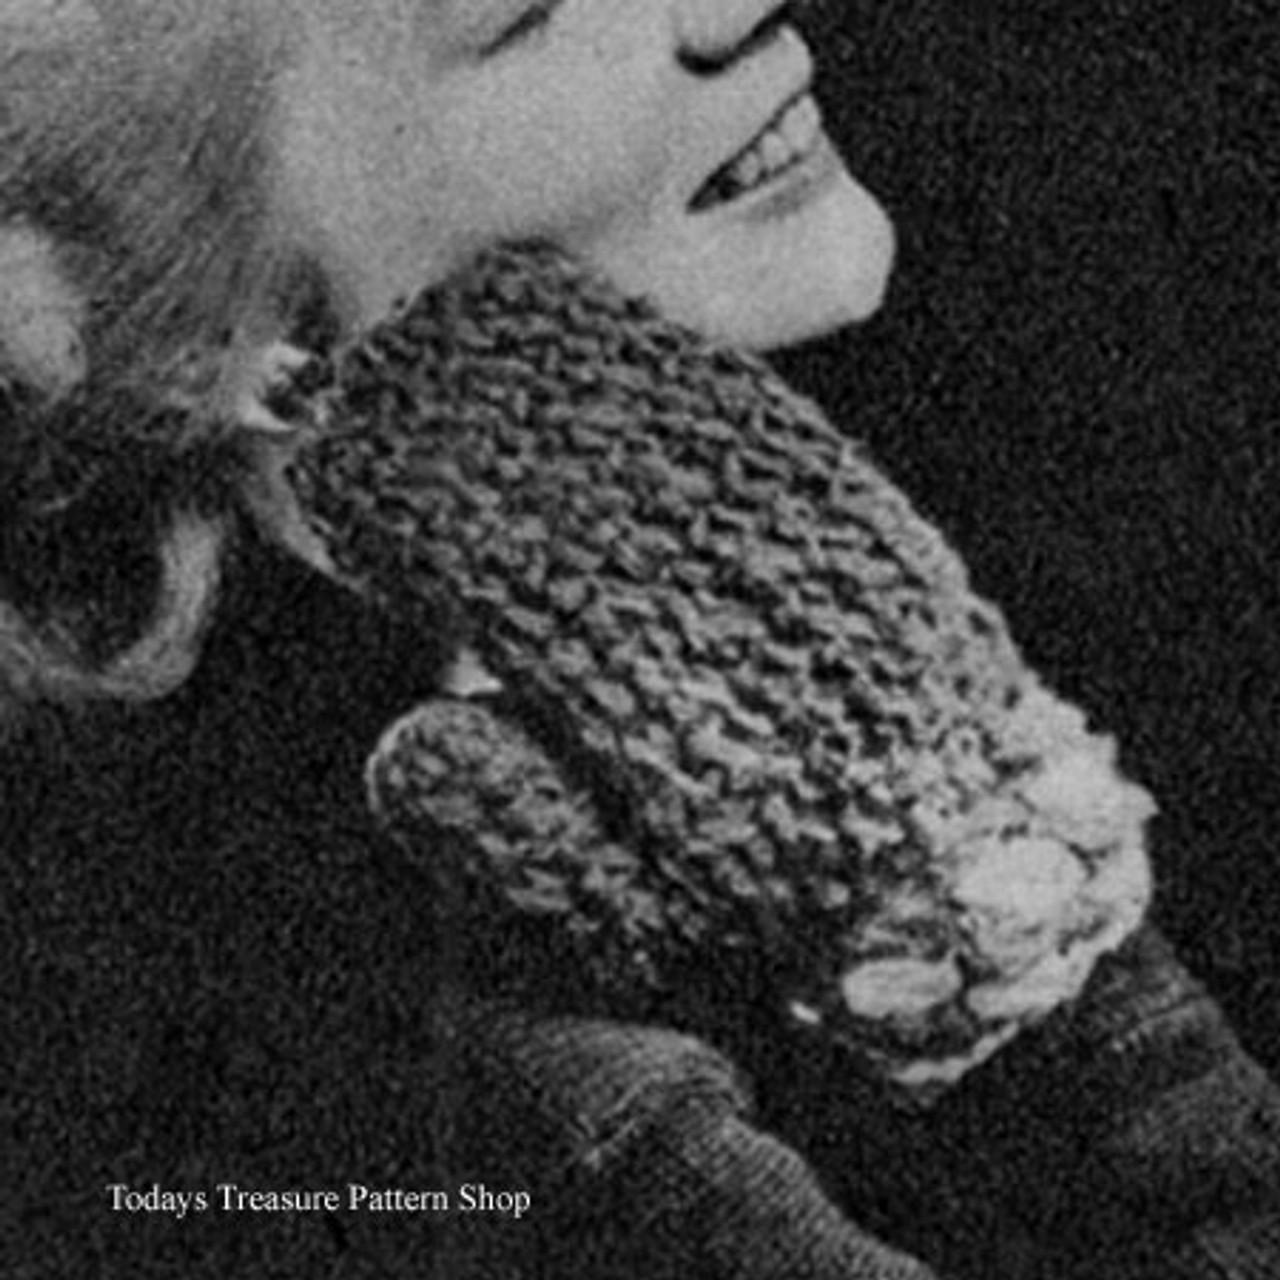 Crocheted Blue Mittens Pattern, Vintage 1940s